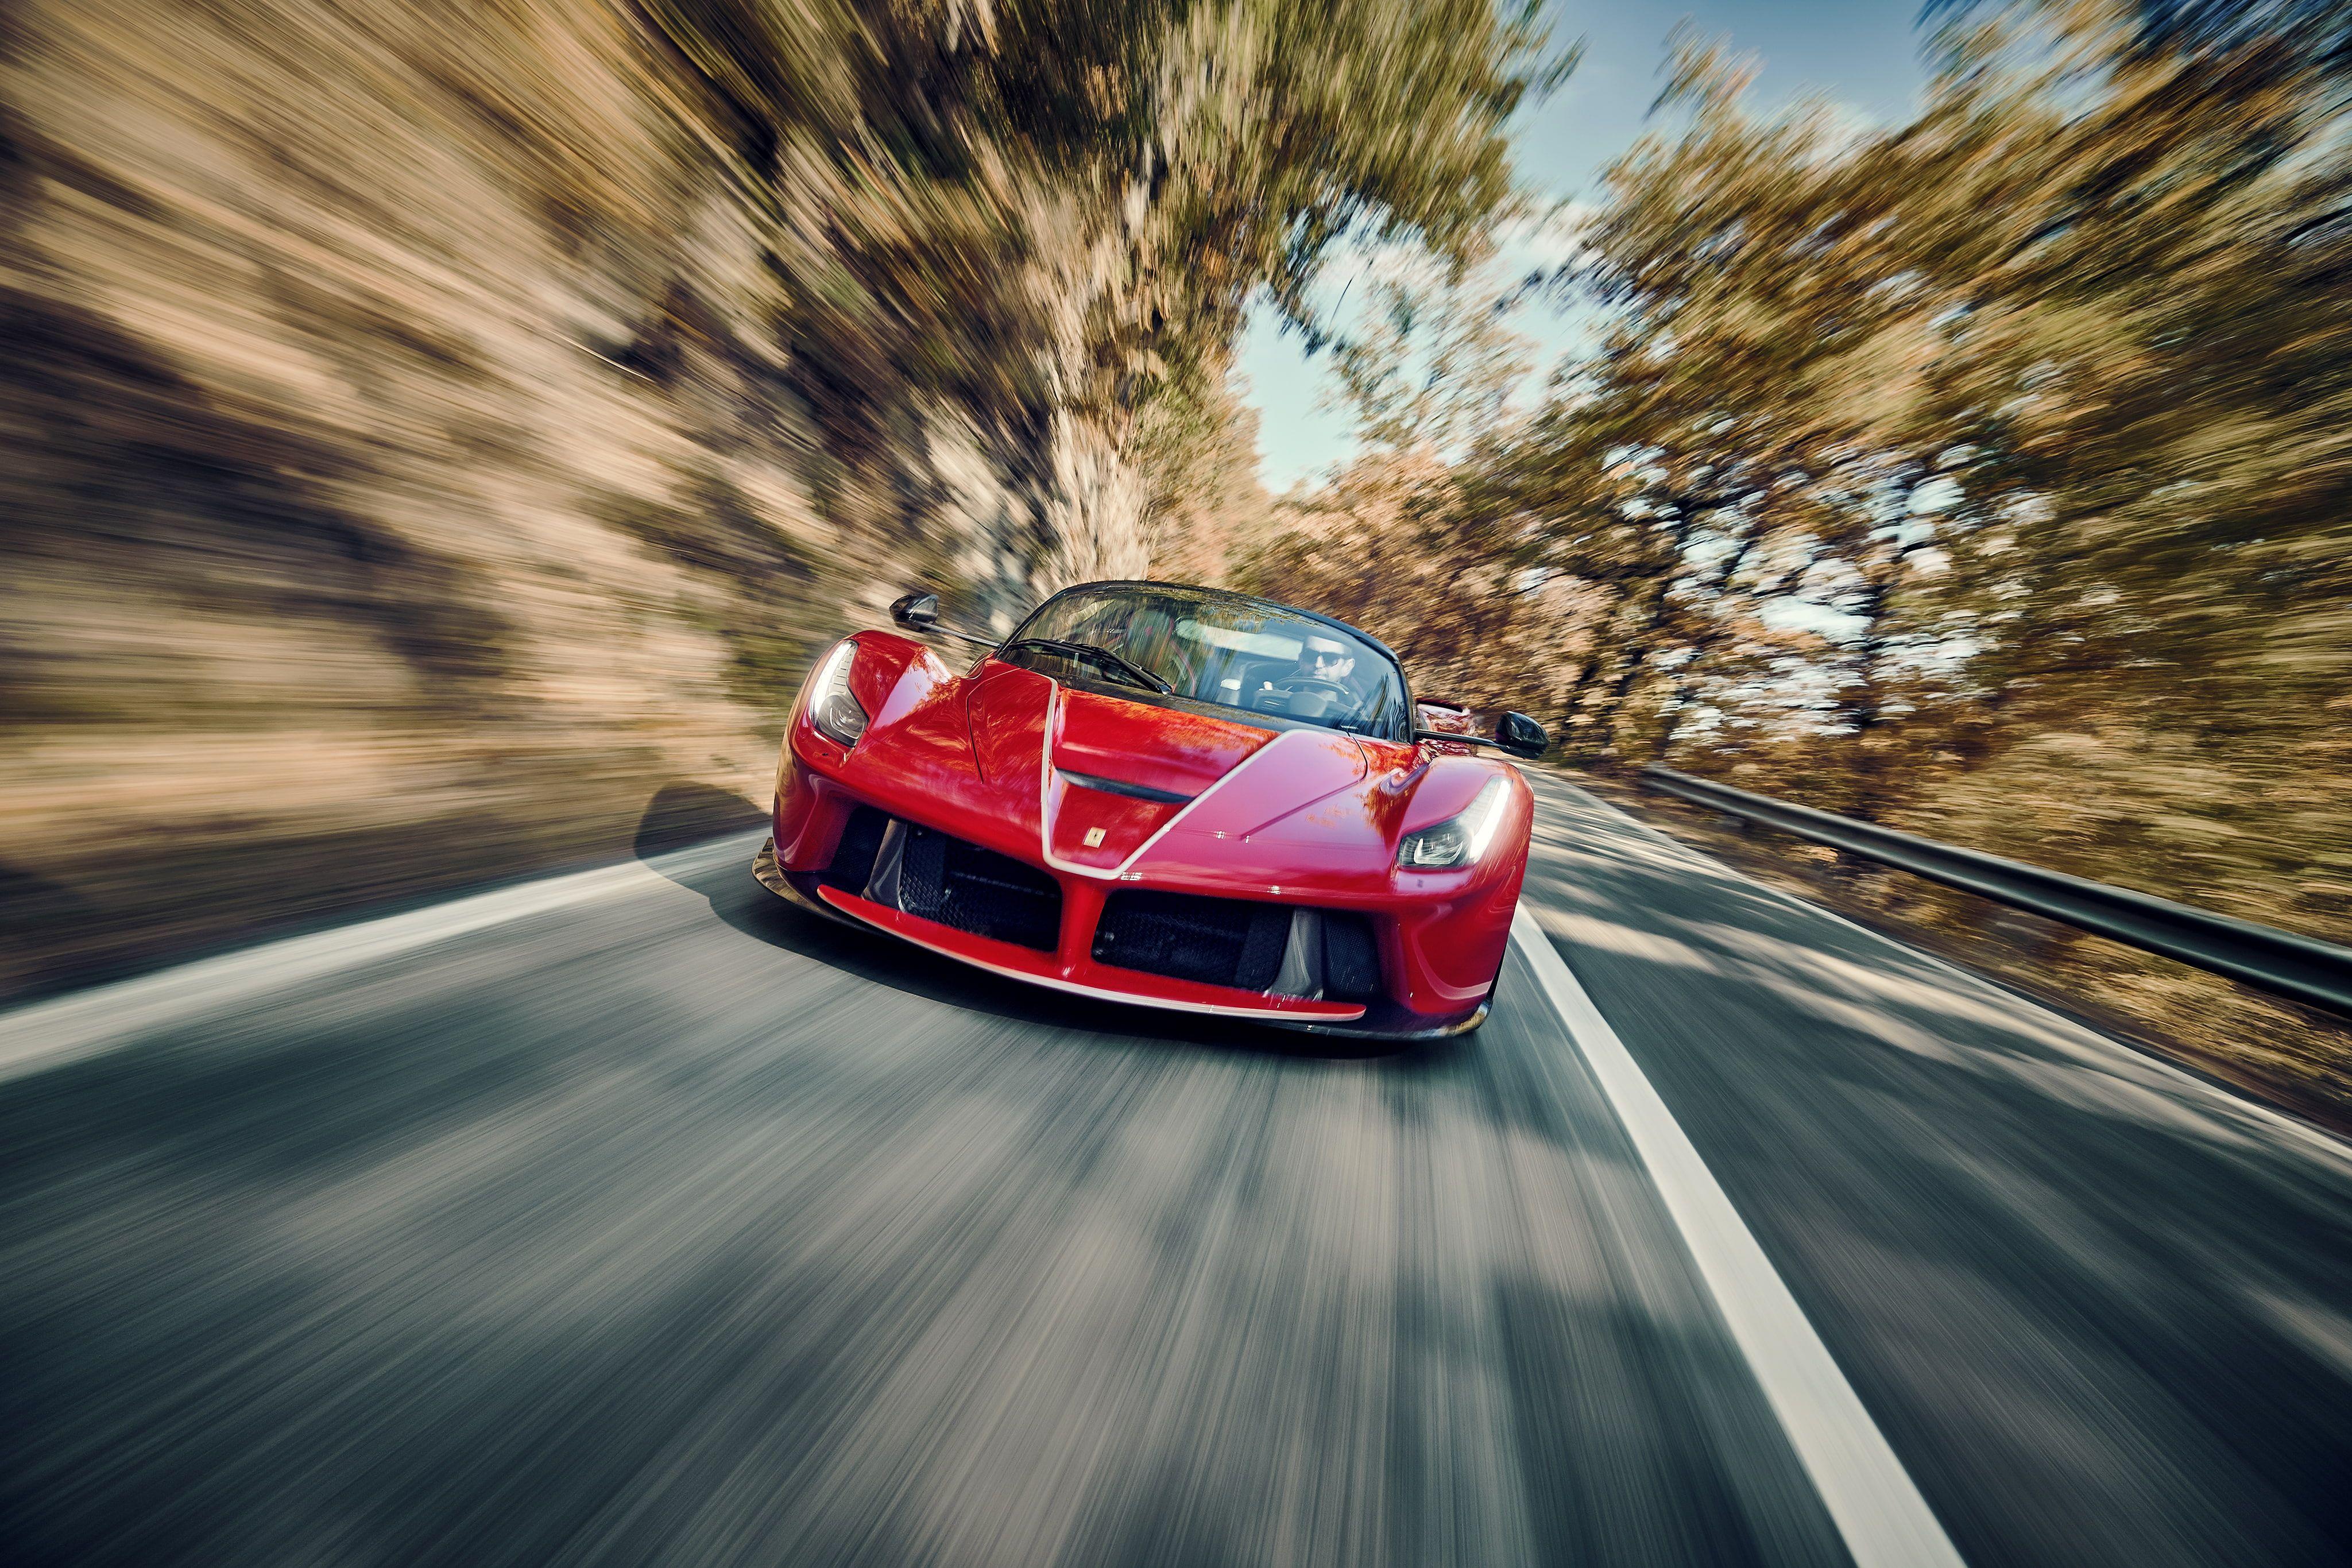 2016 Aperta Ferrari Laferrari Supercar 4k Wallpaper Hdwallpaper Desktop Super Cars Ferrari Ferrari Laferrari